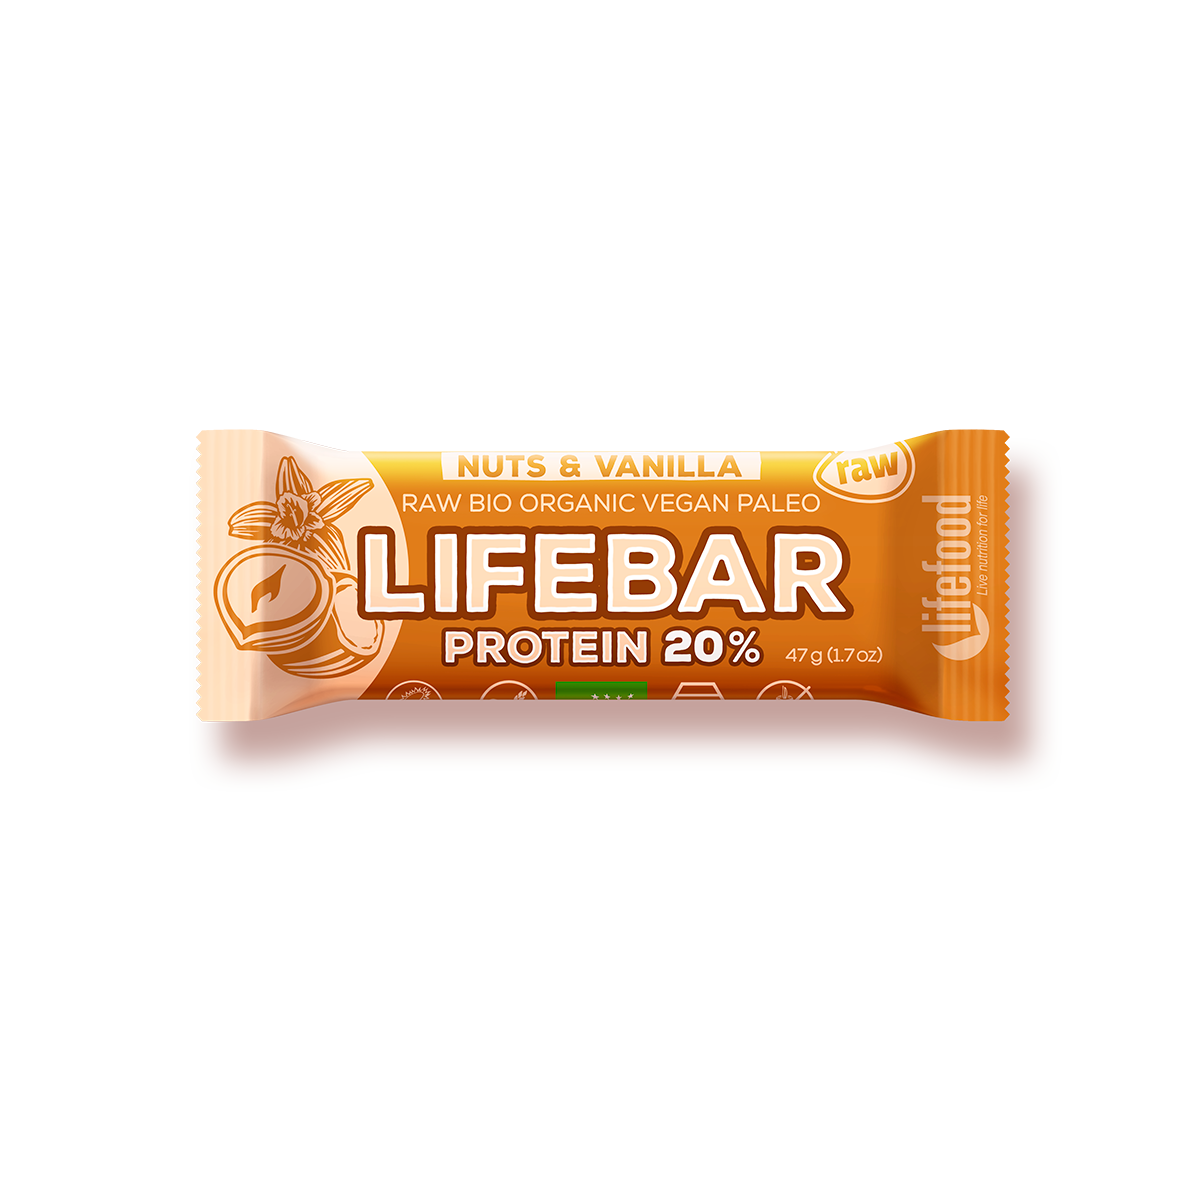 http://contao.lifefood.eu/tl_files/data/en/NEW products/lifebars/lifebars protein/nuts vanilla/Lifebar-Protein-VANILLA-HAZELNUT_1200x1200px.png